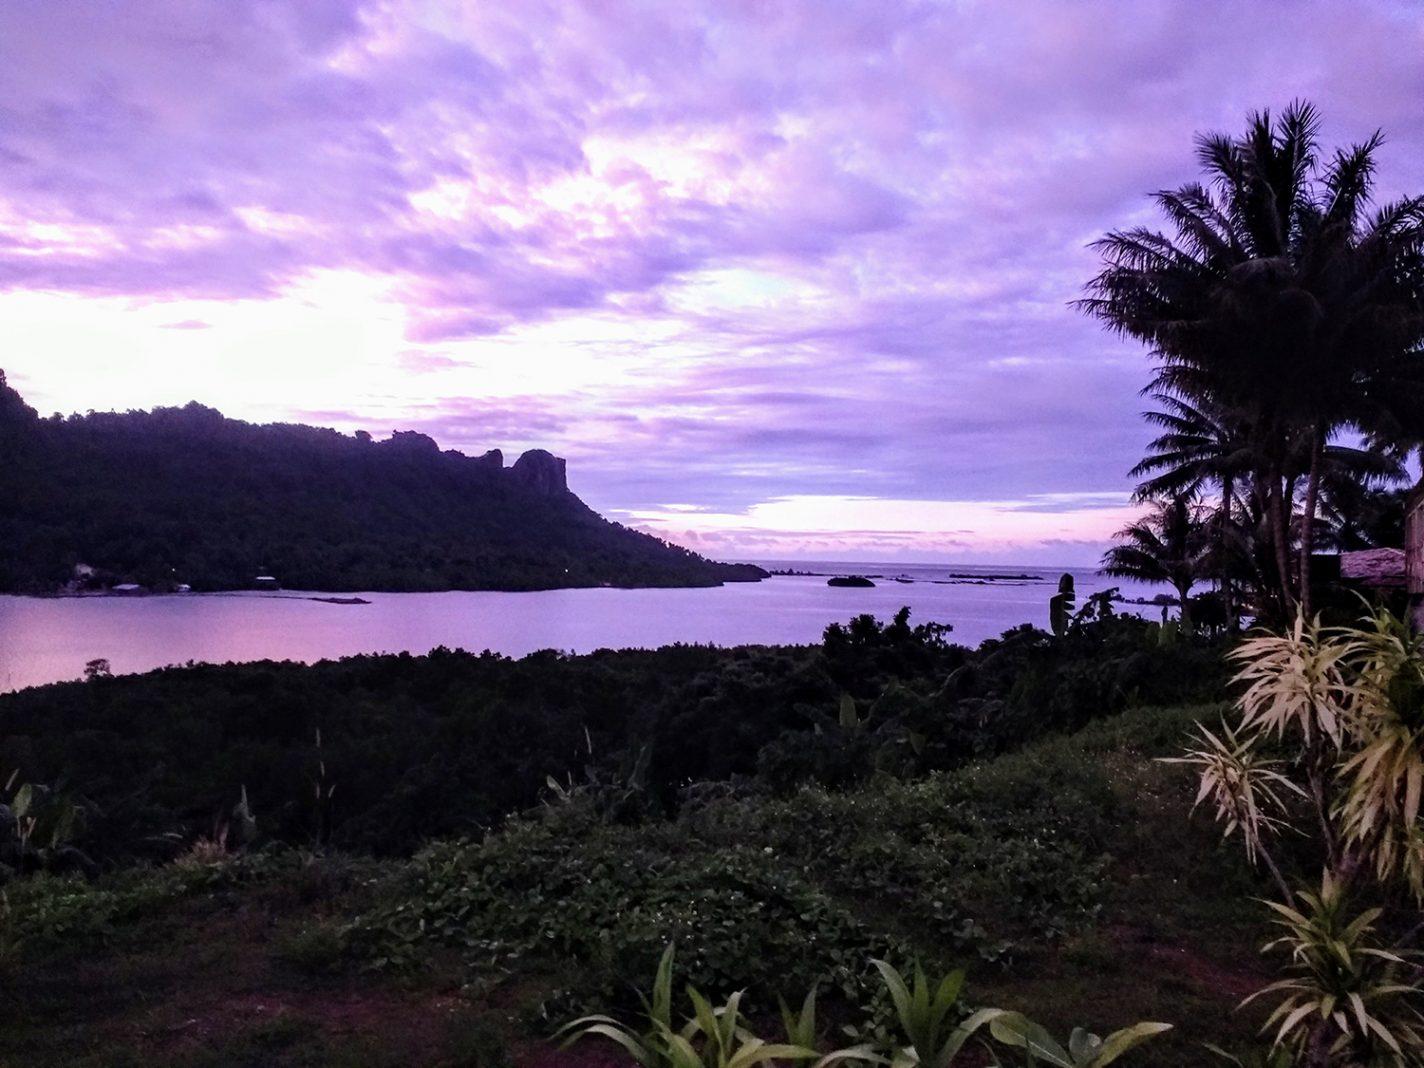 Prachtig uitzicht vanaf ons hotel - Pohnpei in Micronesie